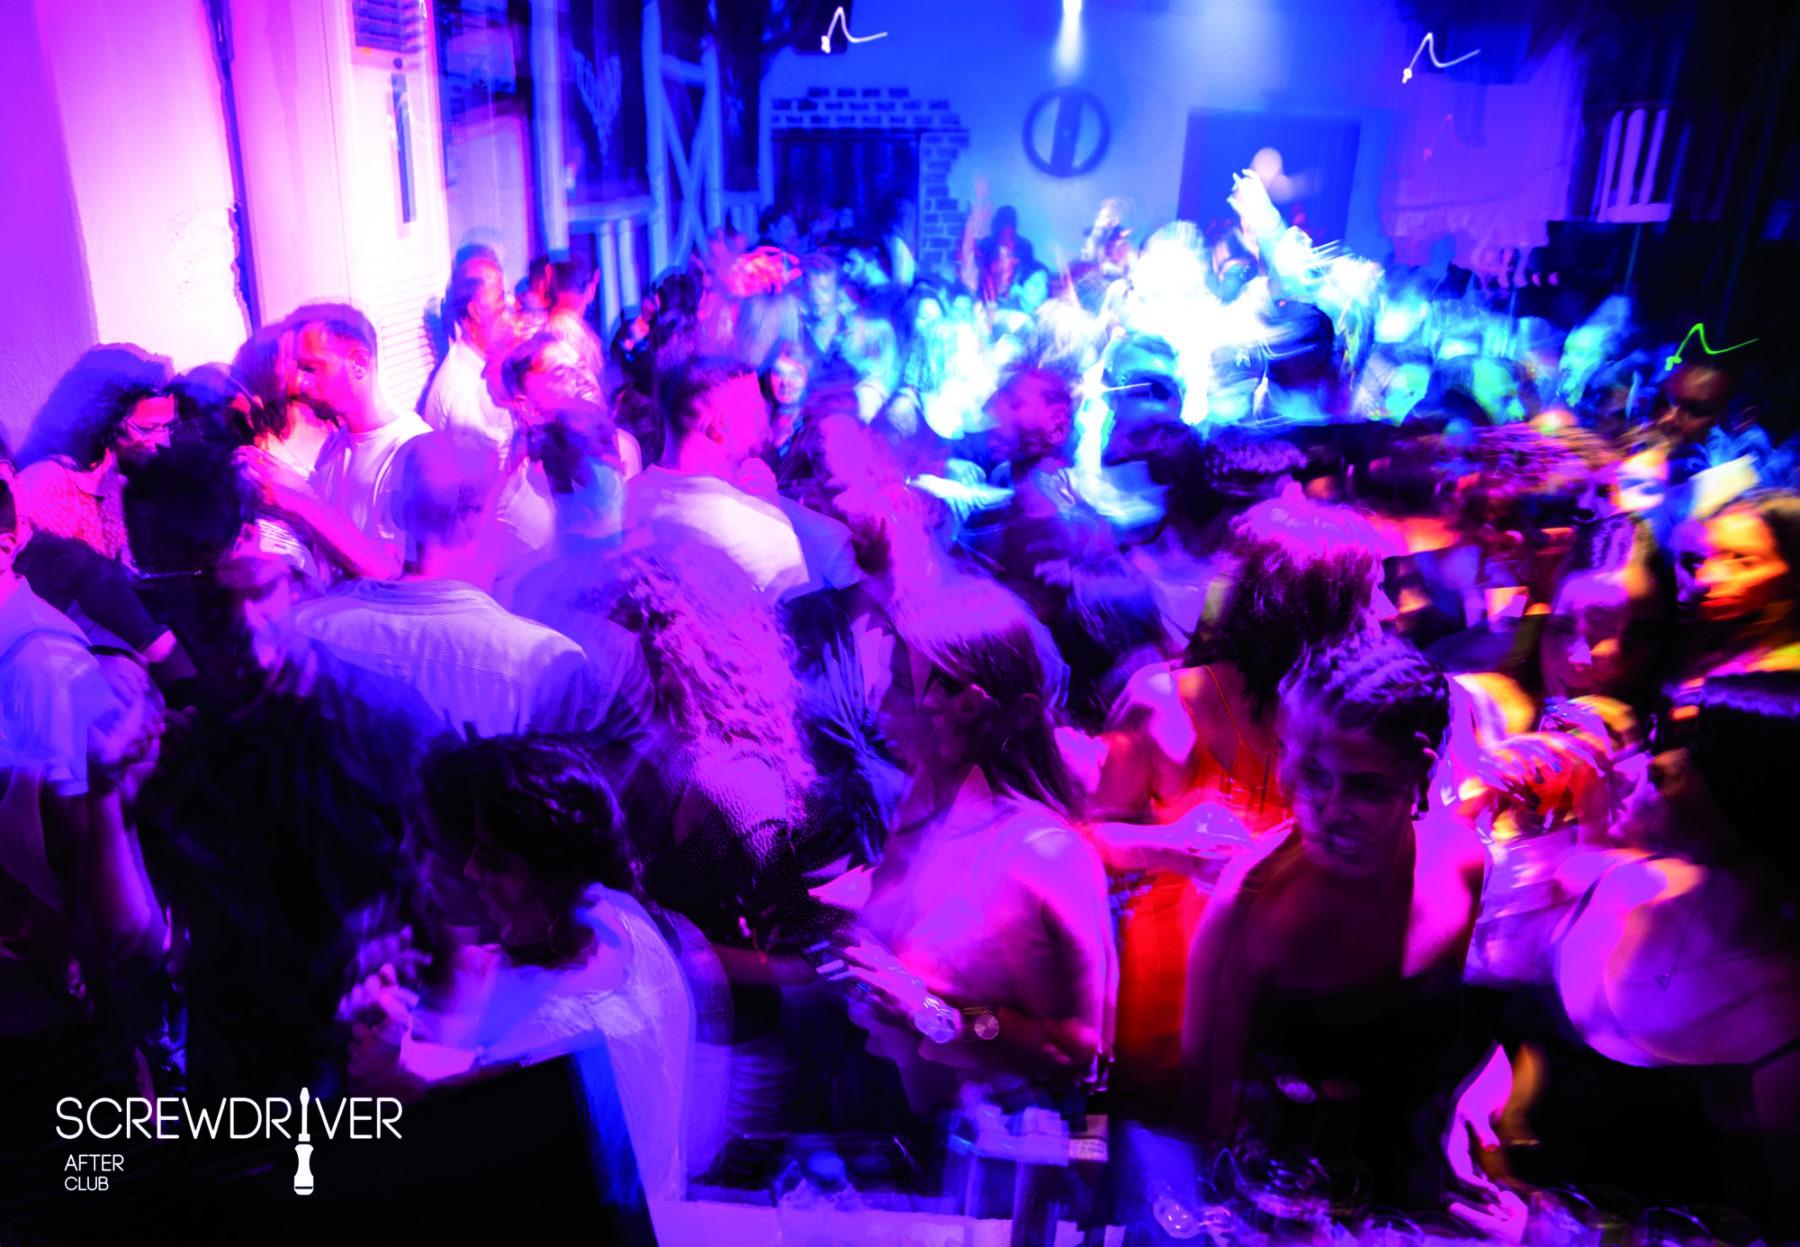 Screwdriver night club